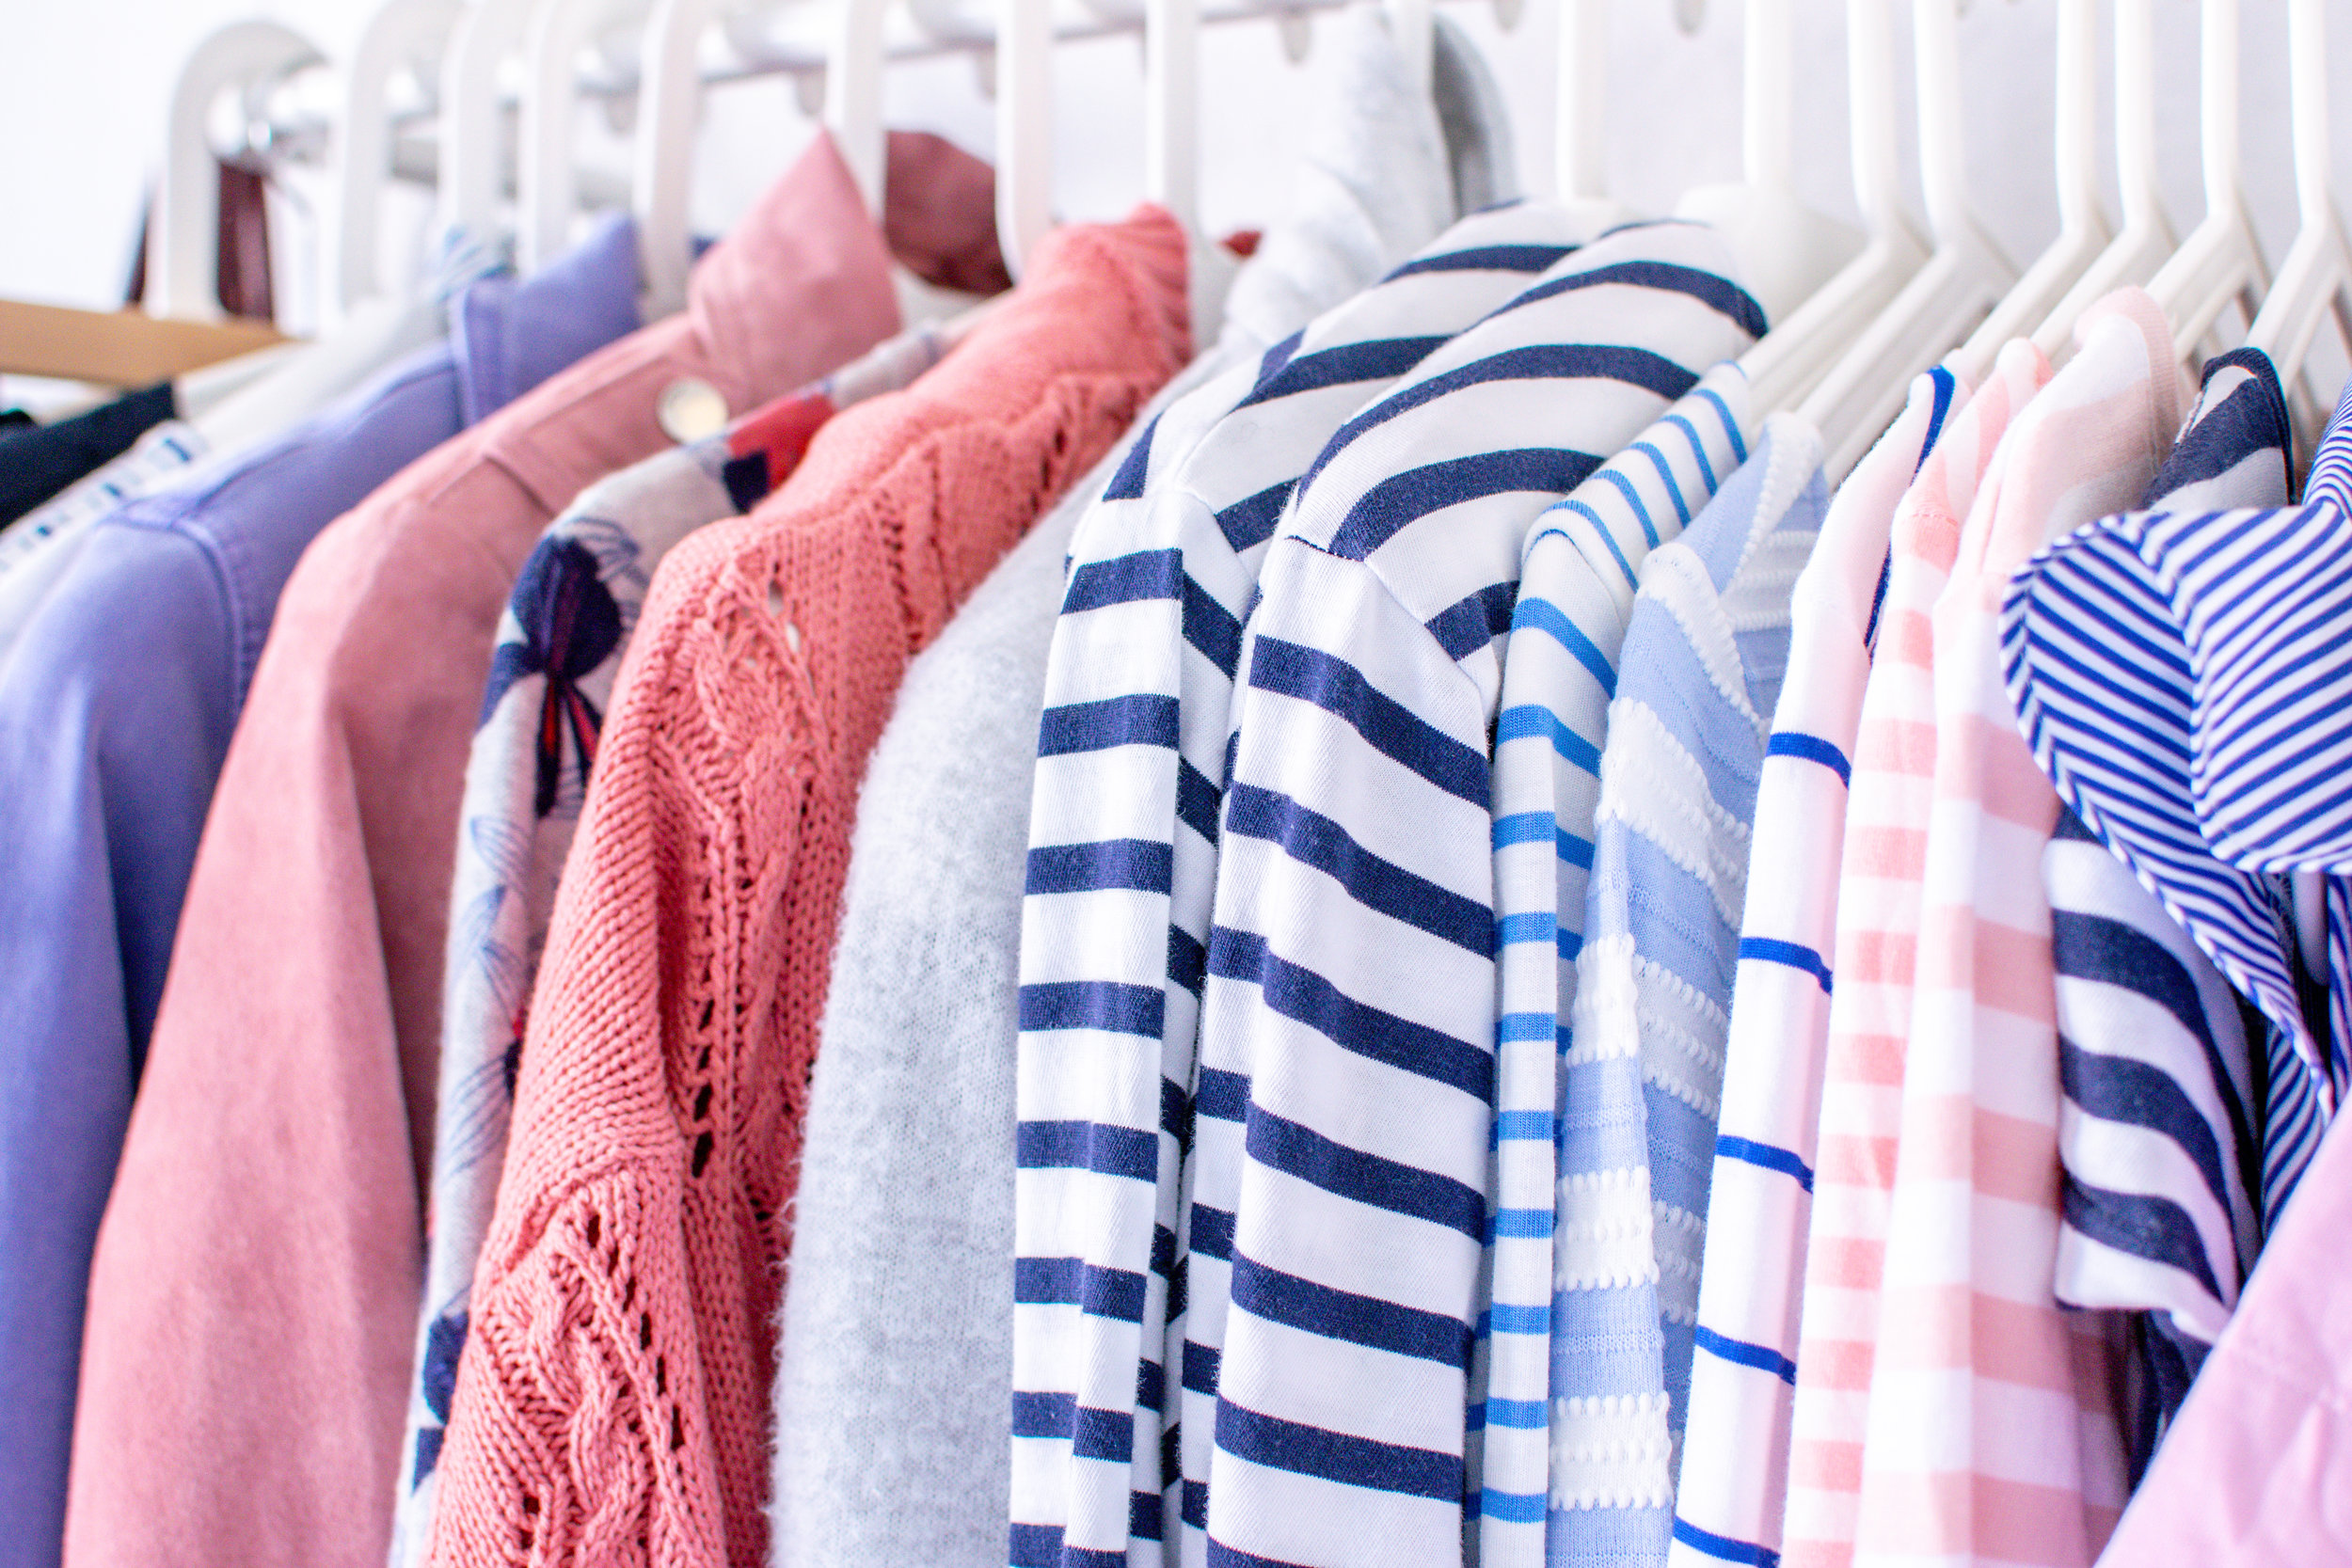 capsule wardrobes shirts